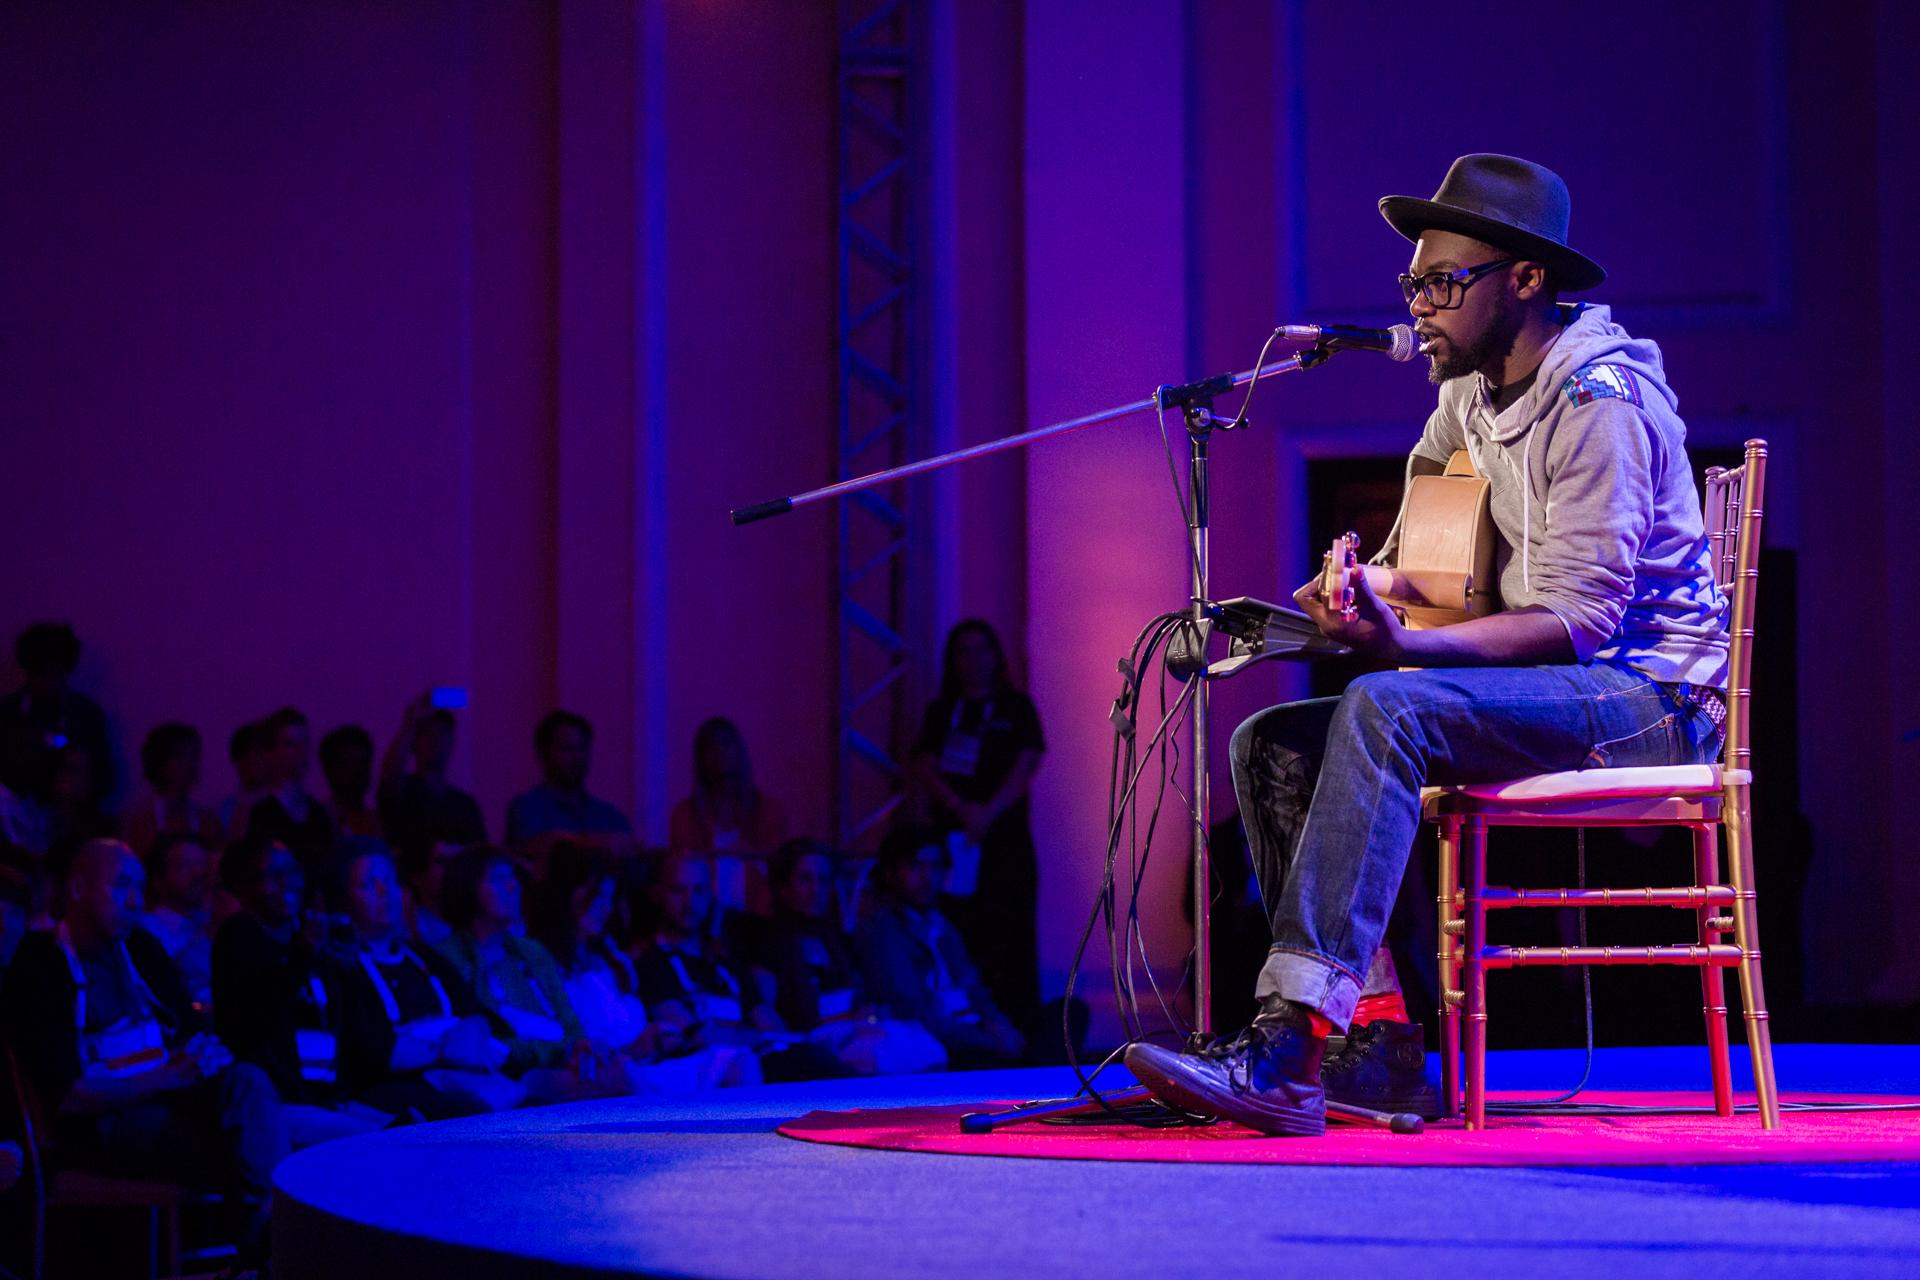 Bill Sellanga seranades the audience at the start of Fellows session 2 at TEDGlobal 2014. Photo: Ryan Lash